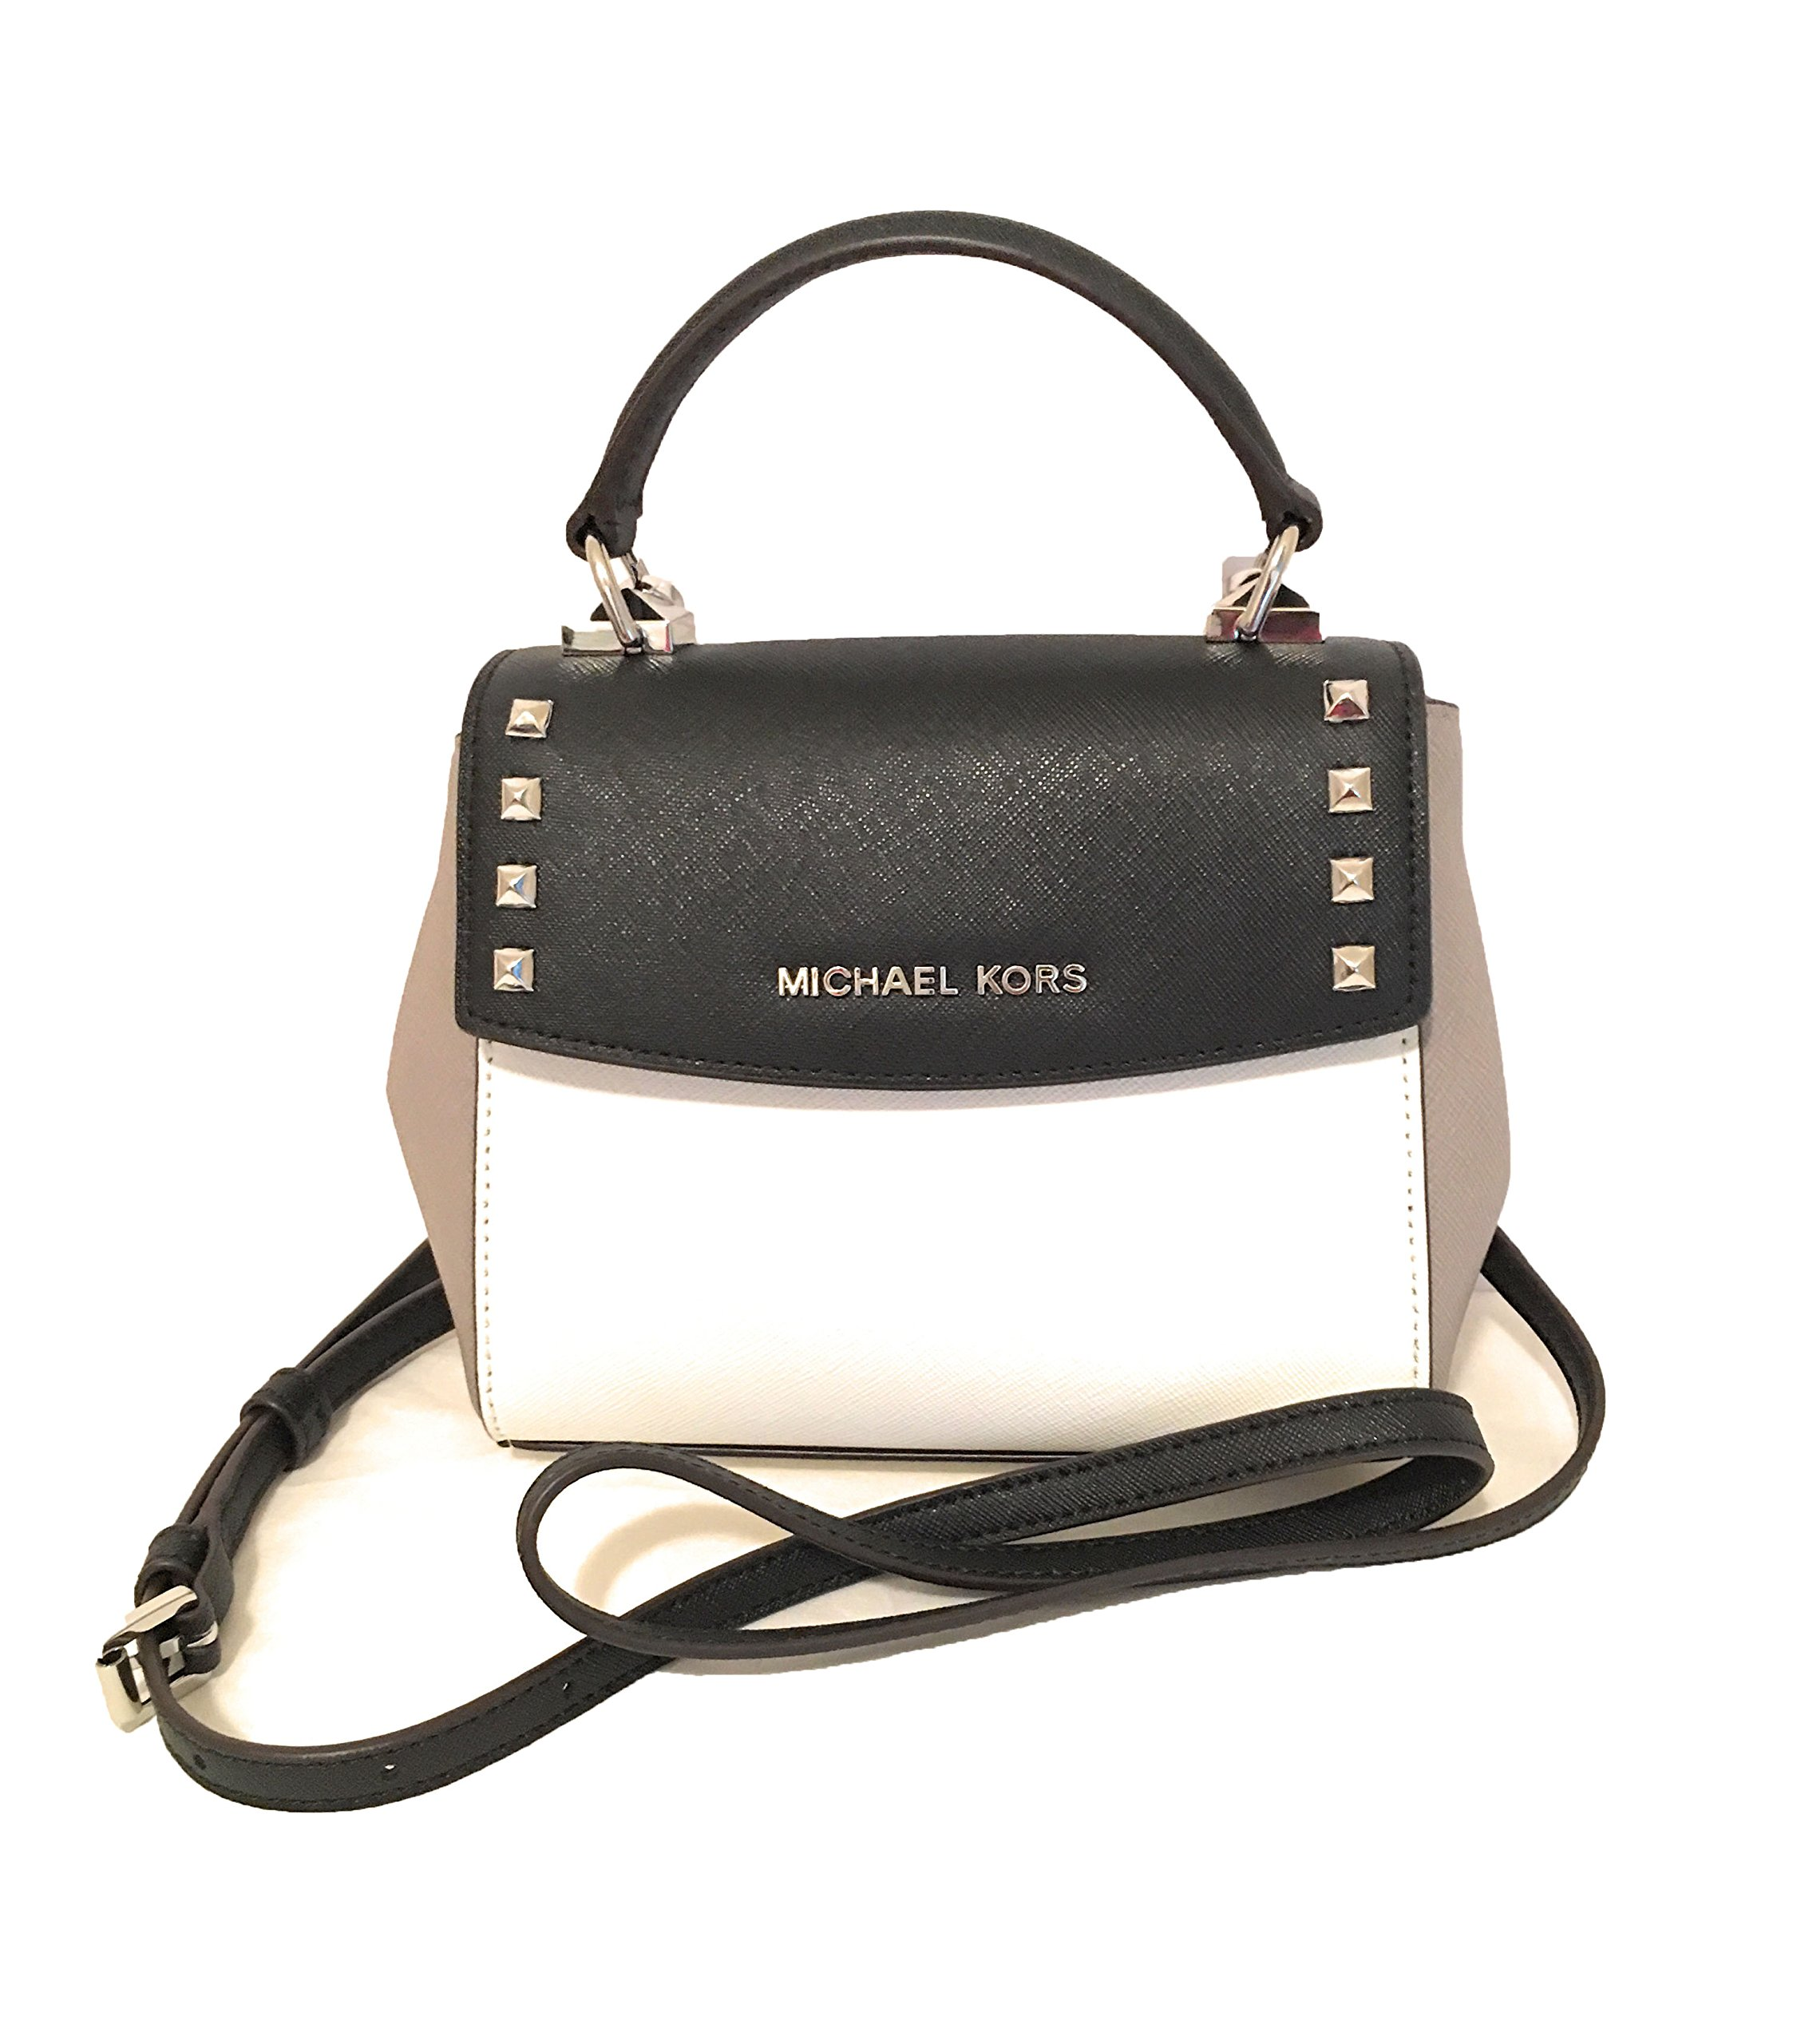 9f3cb98e2c36 Galleon - Michael Kors Karla Mini Convertible Saffiano Leather Crossbody  Handbag (Black/White)